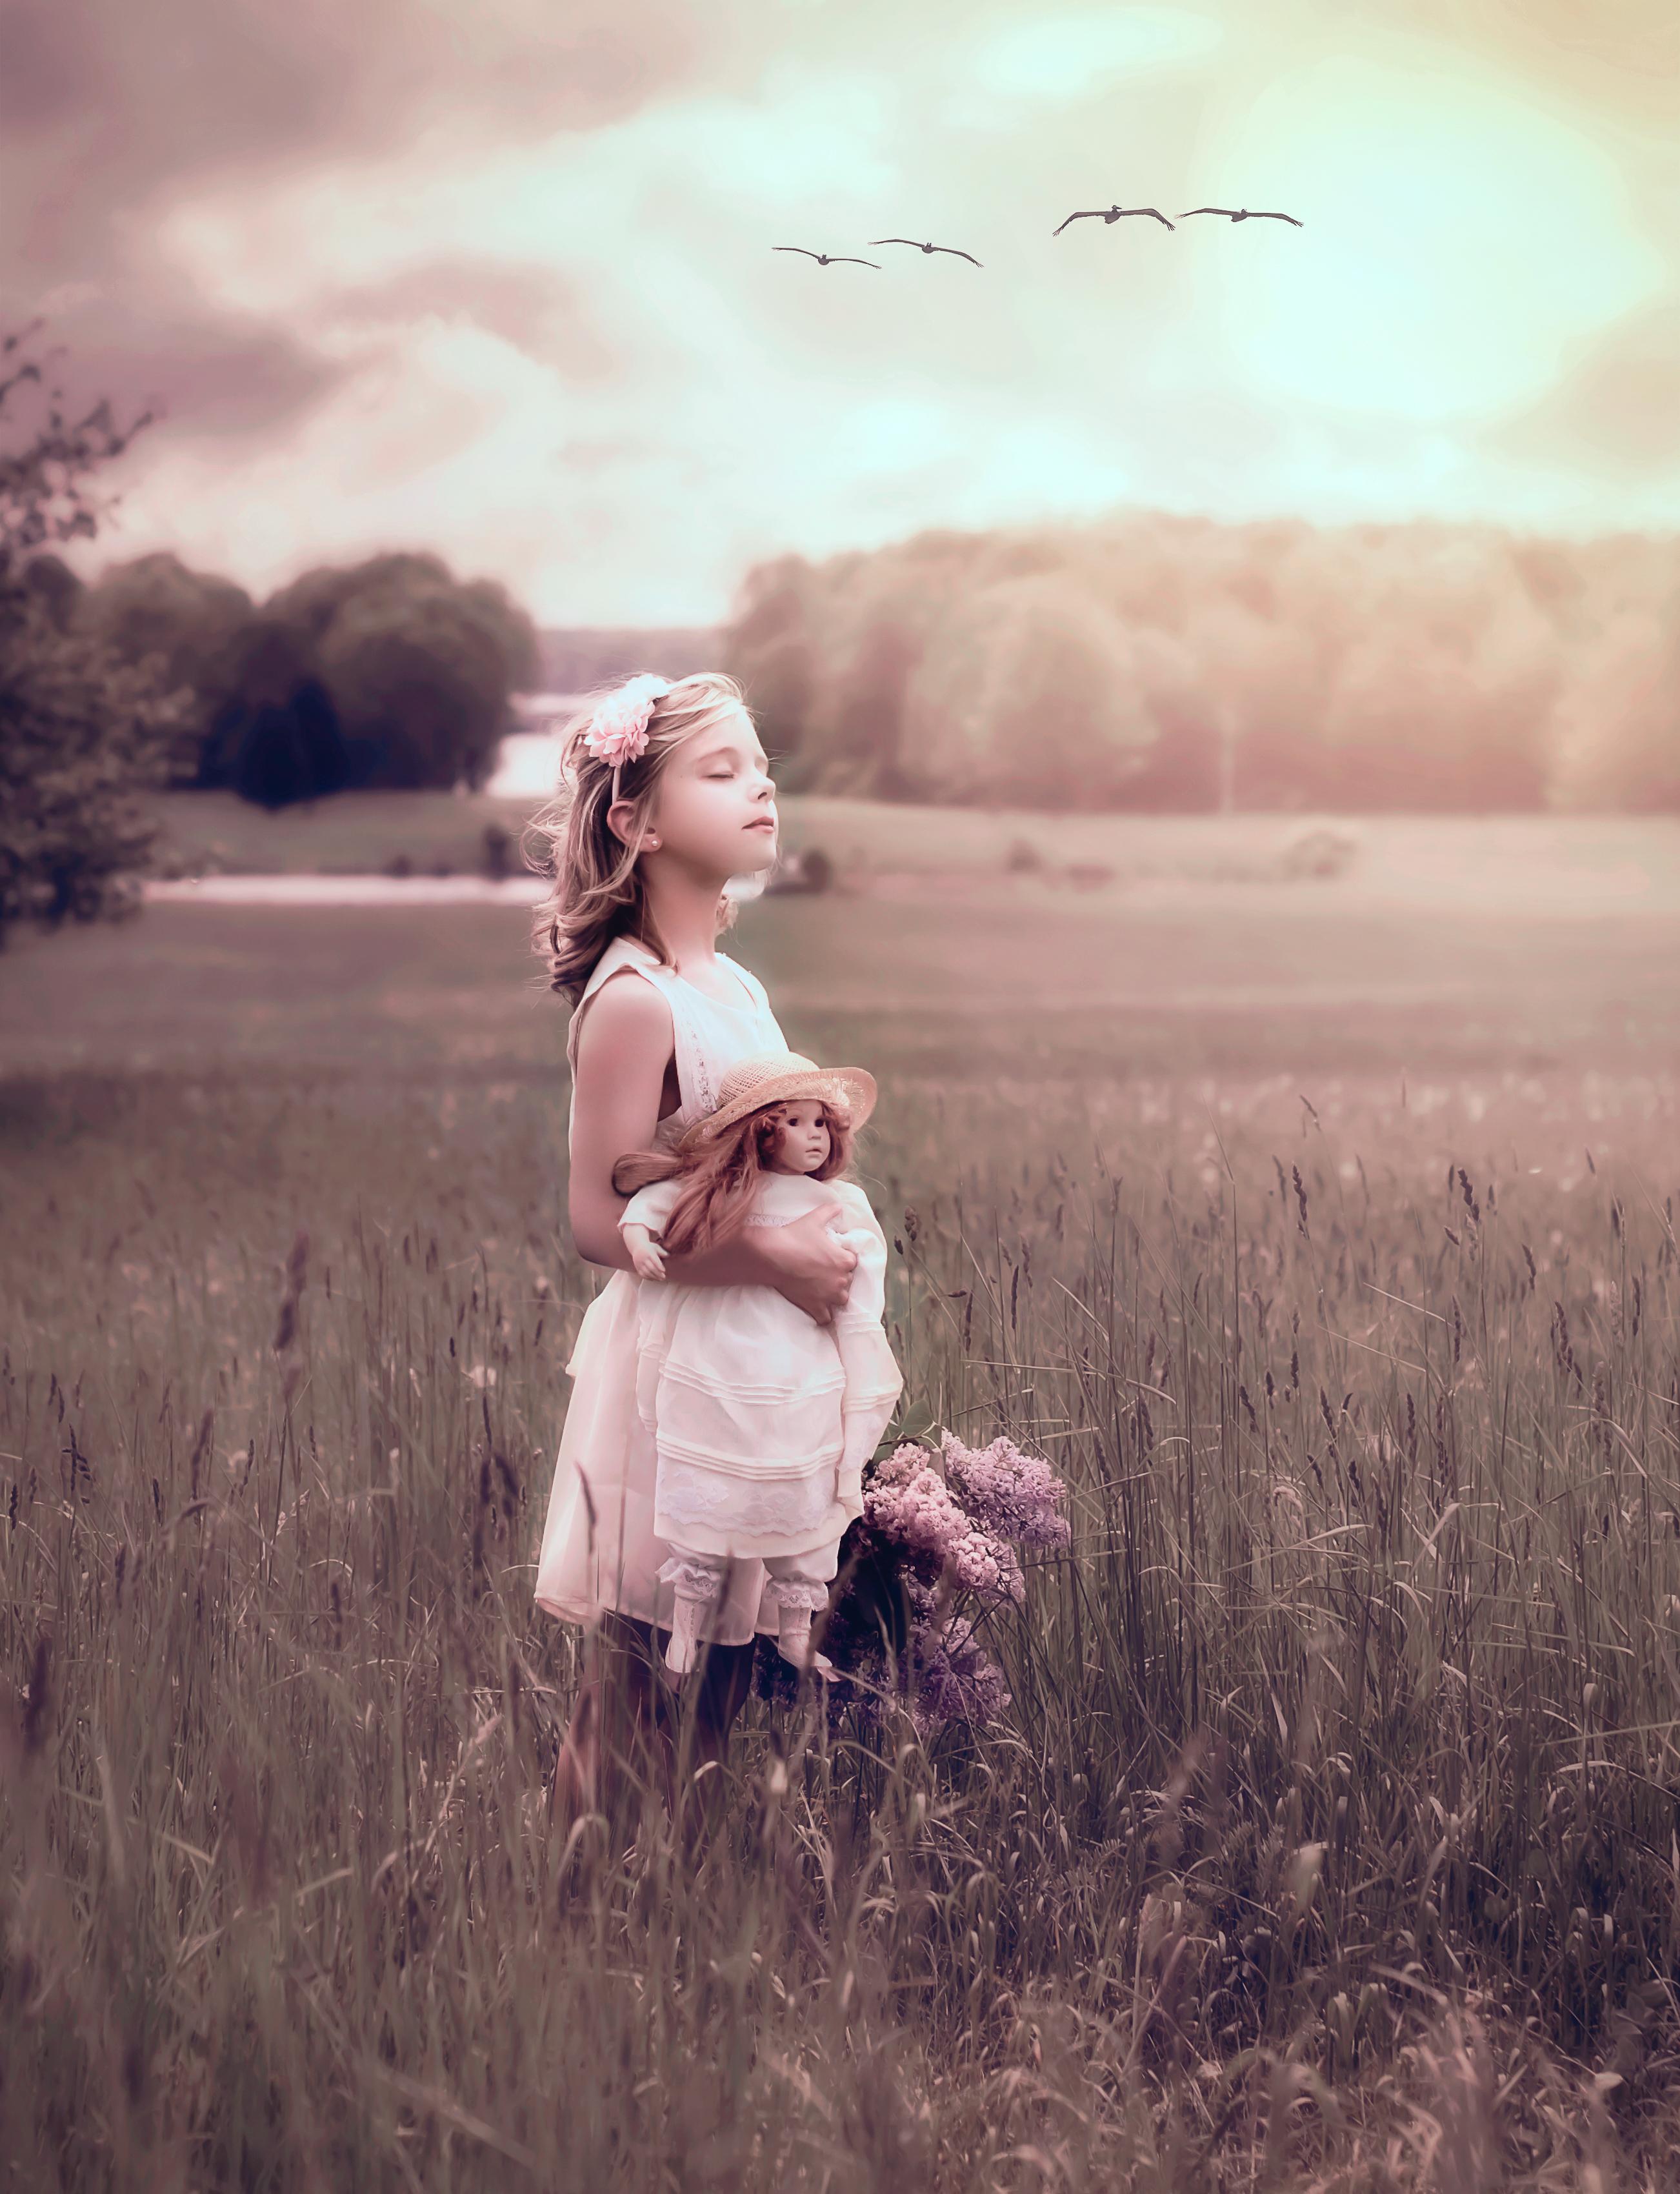 Child in Field